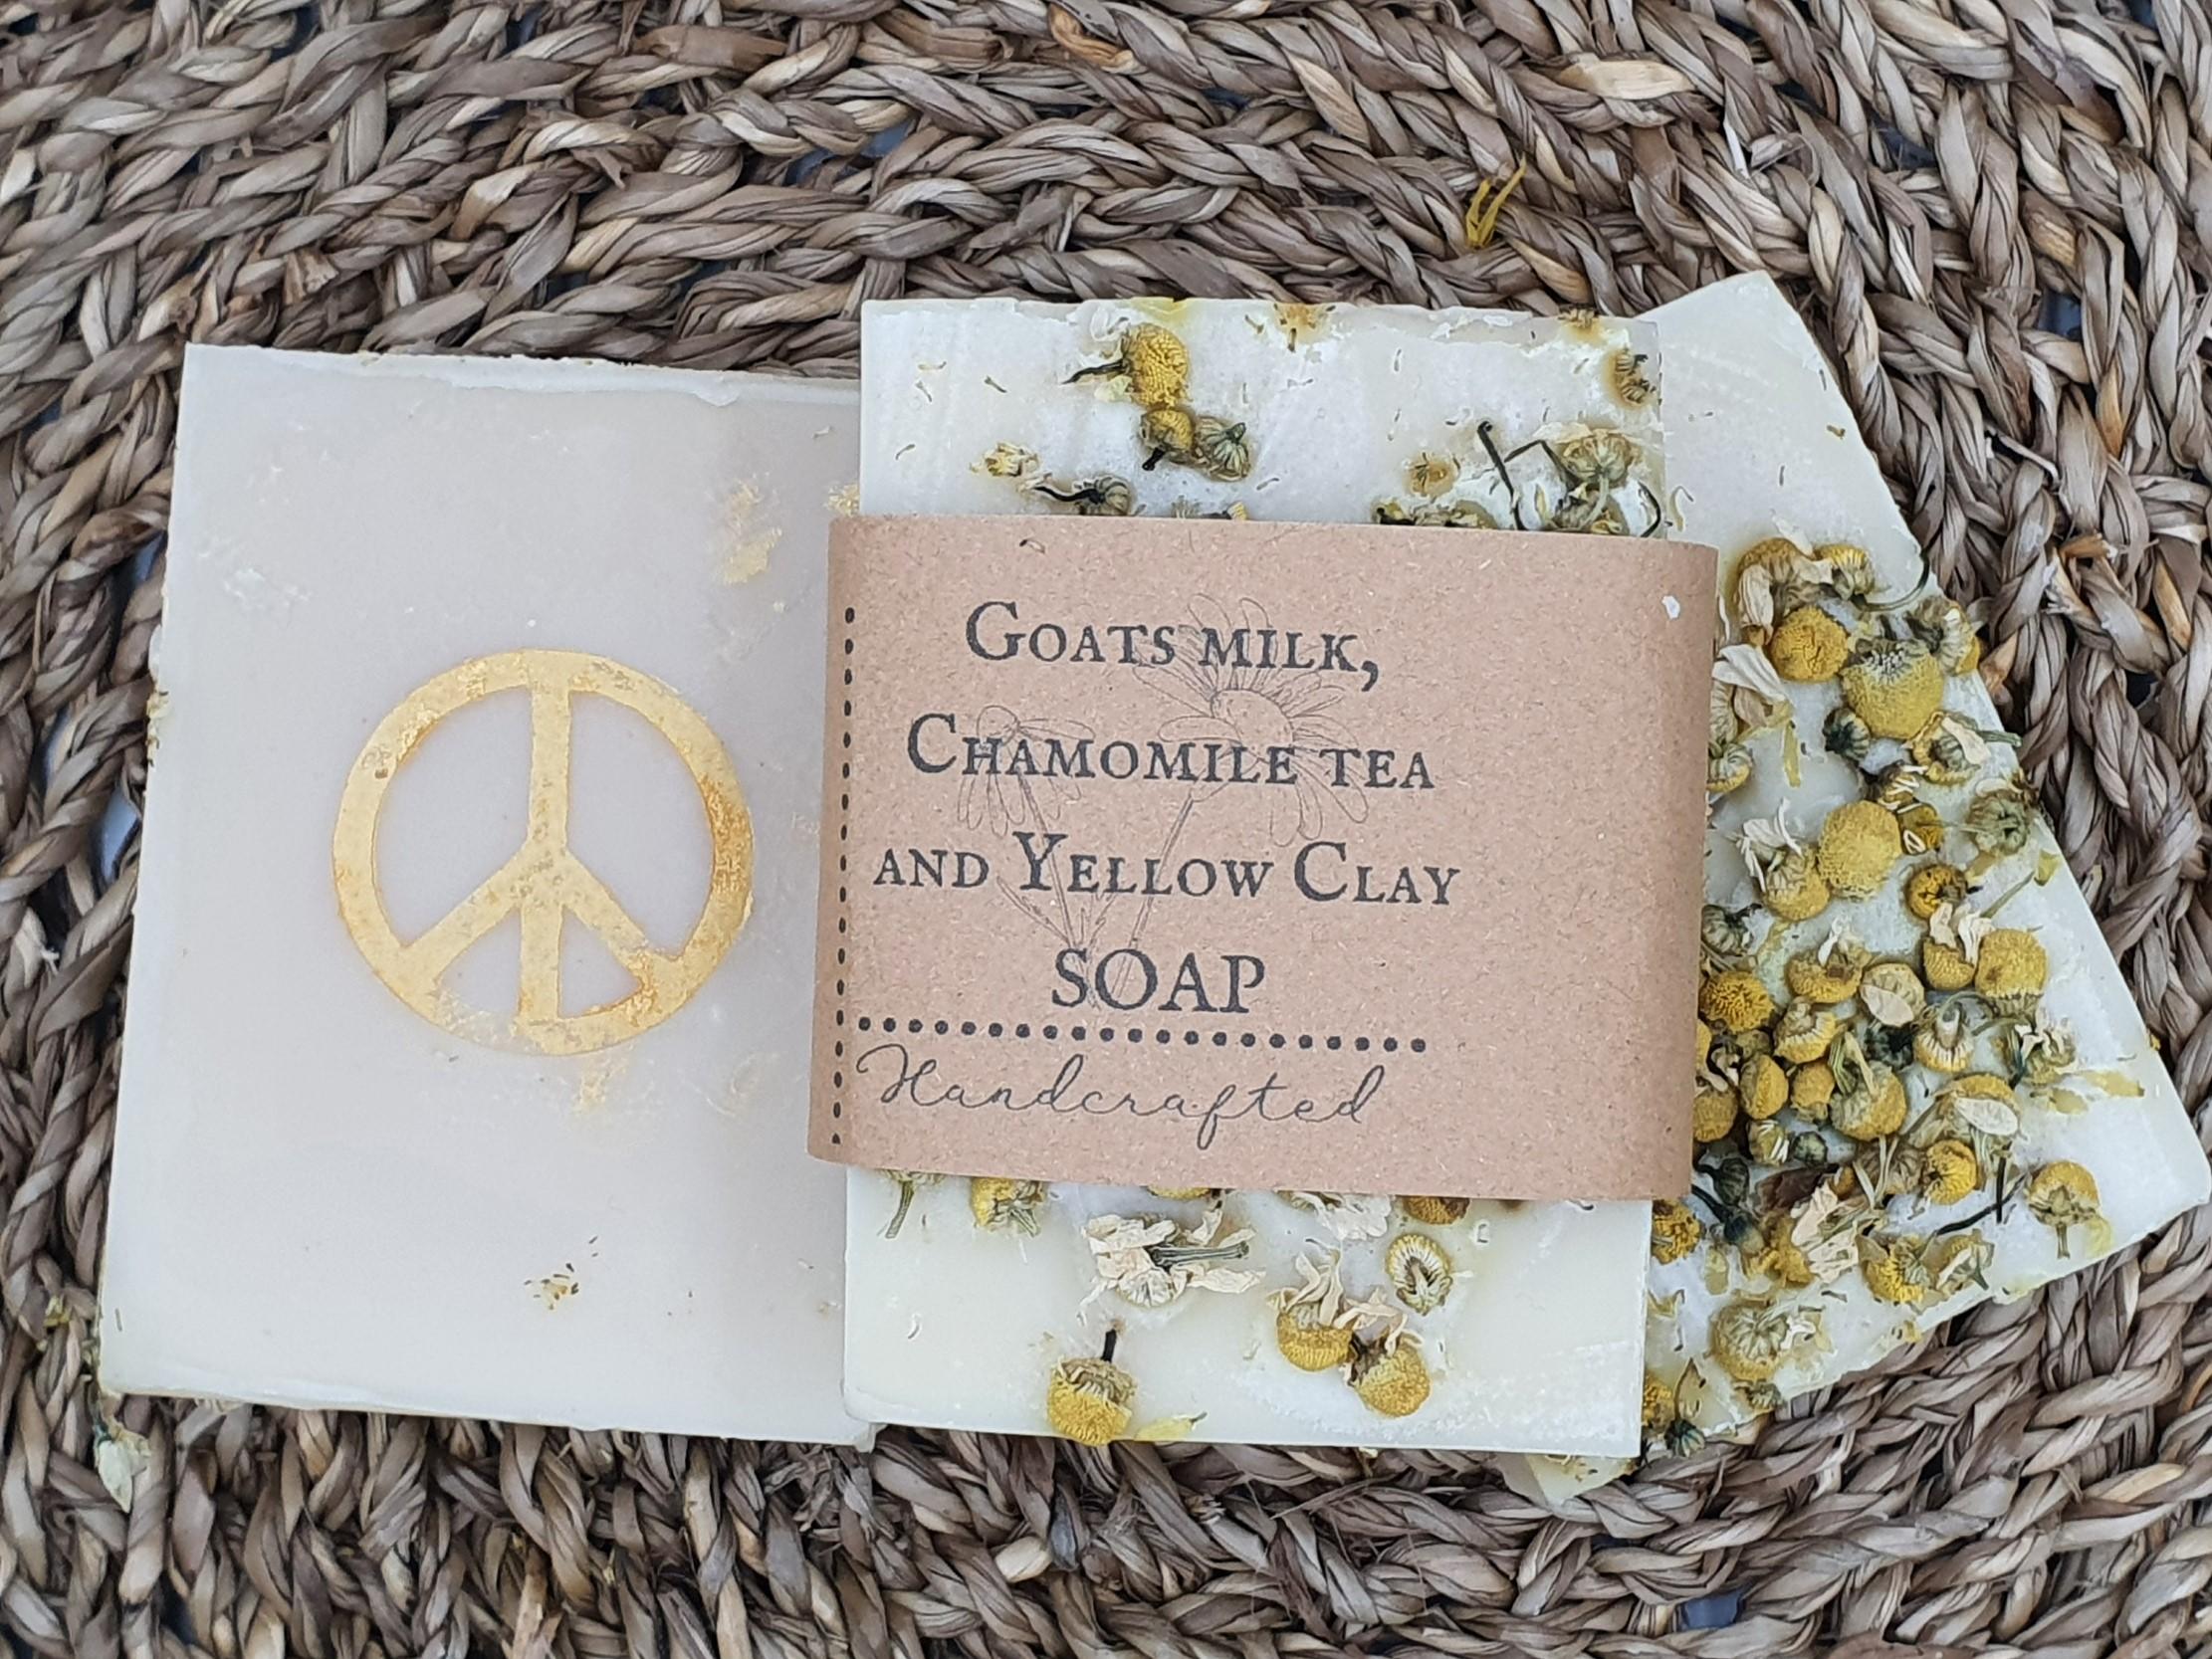 Goats milk,Chamomile tea and Yellow clay soap